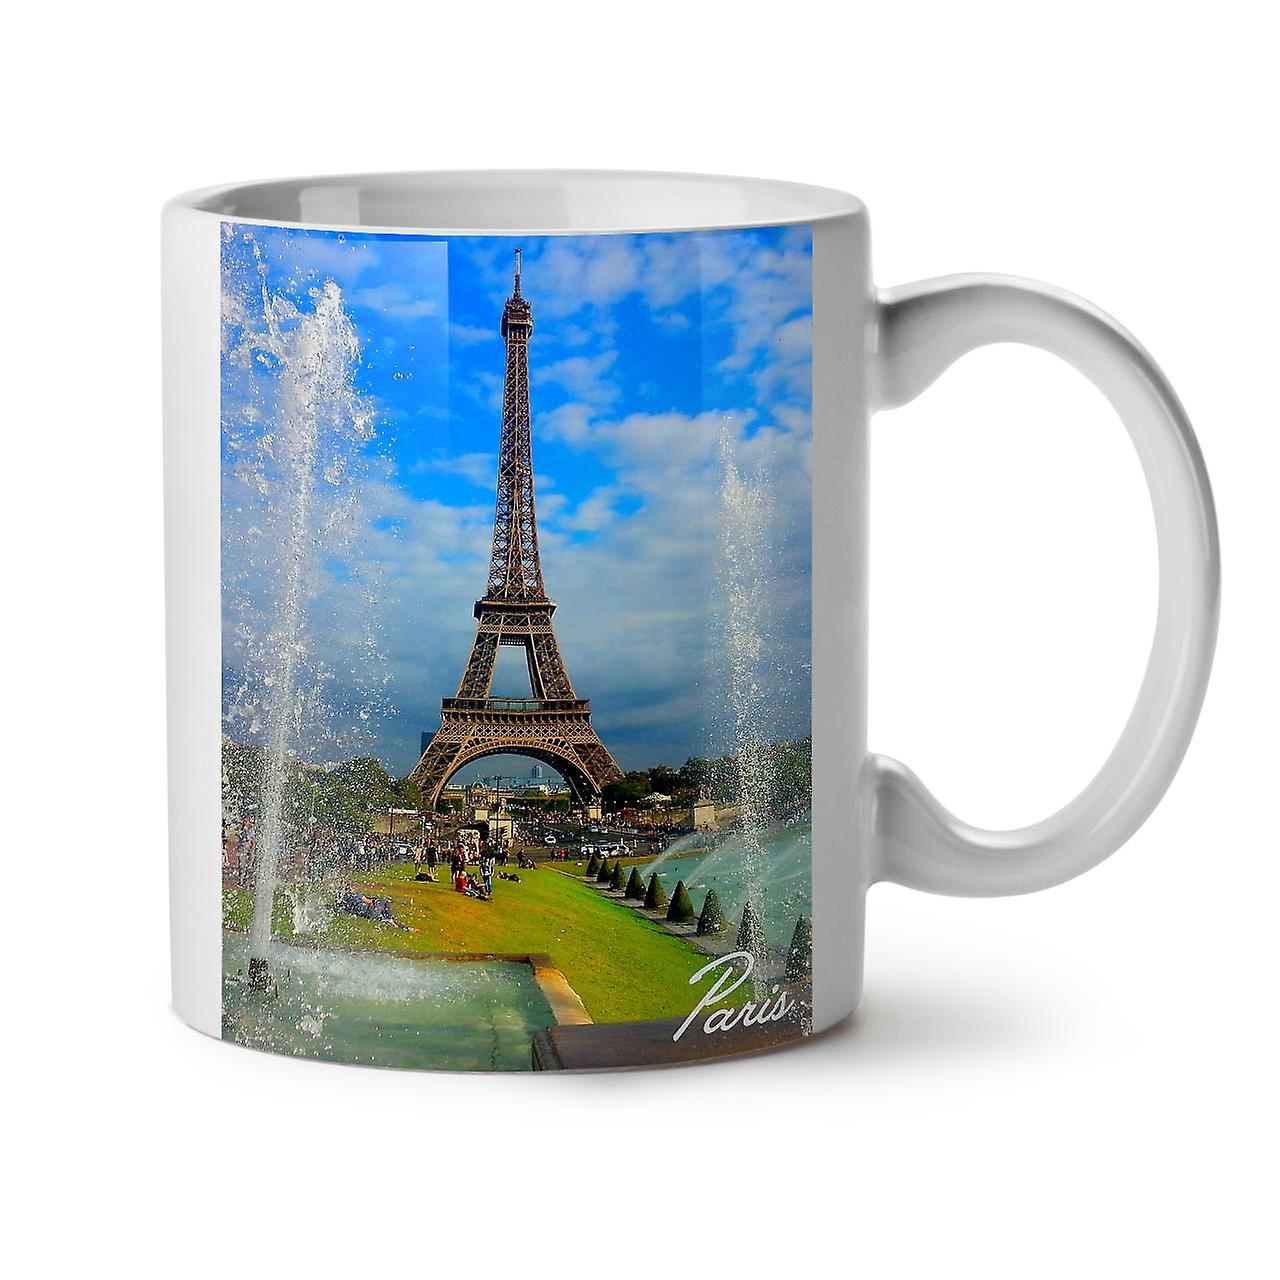 Park Photo Coffee Landmark New Tea Ceramic Mug White 11 OzWellcoda v8nN0wm